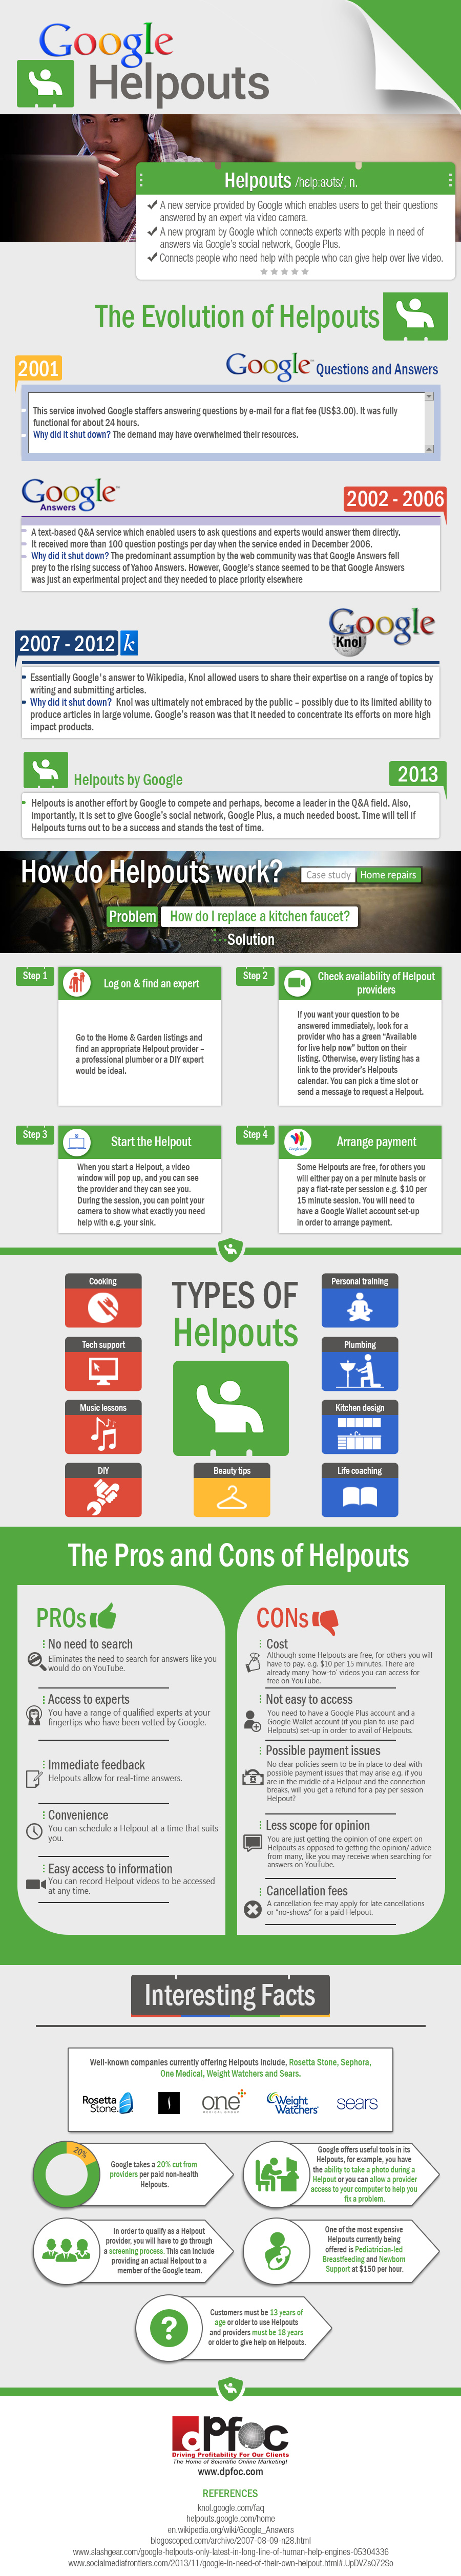 guide Google Helpouts